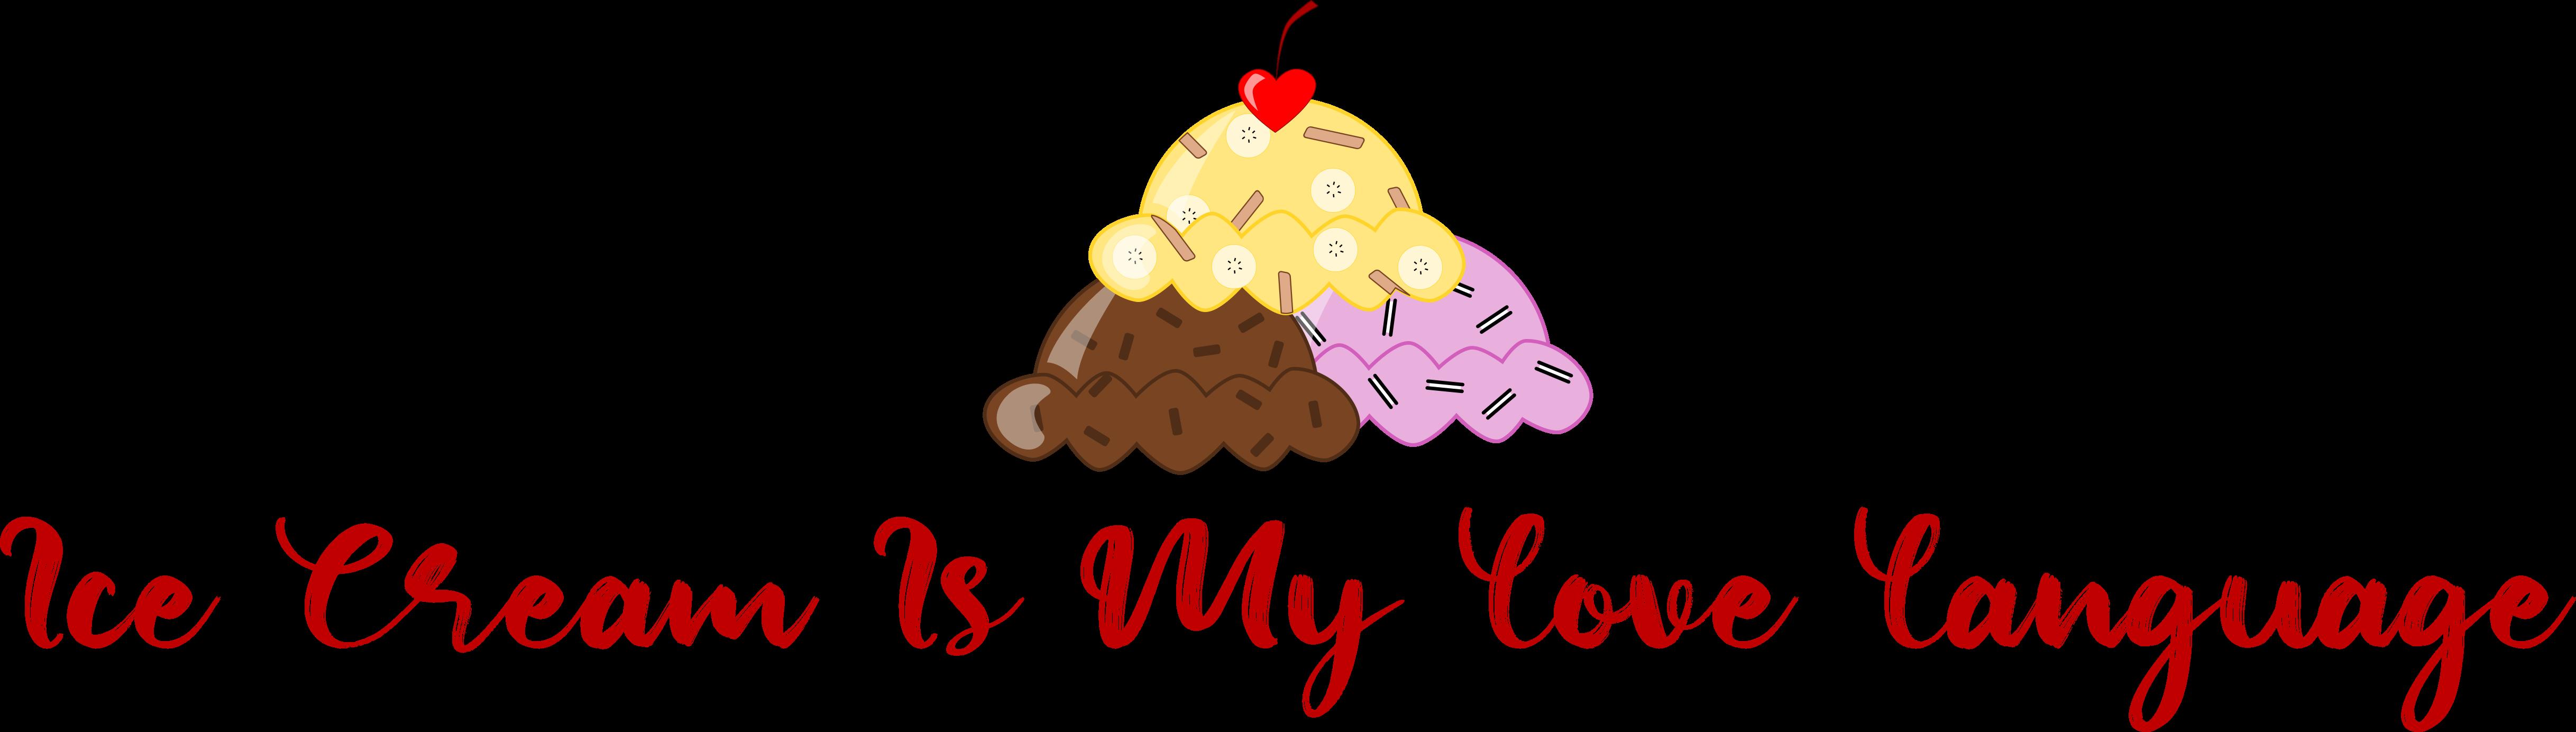 Ice Cream Is My Love Language